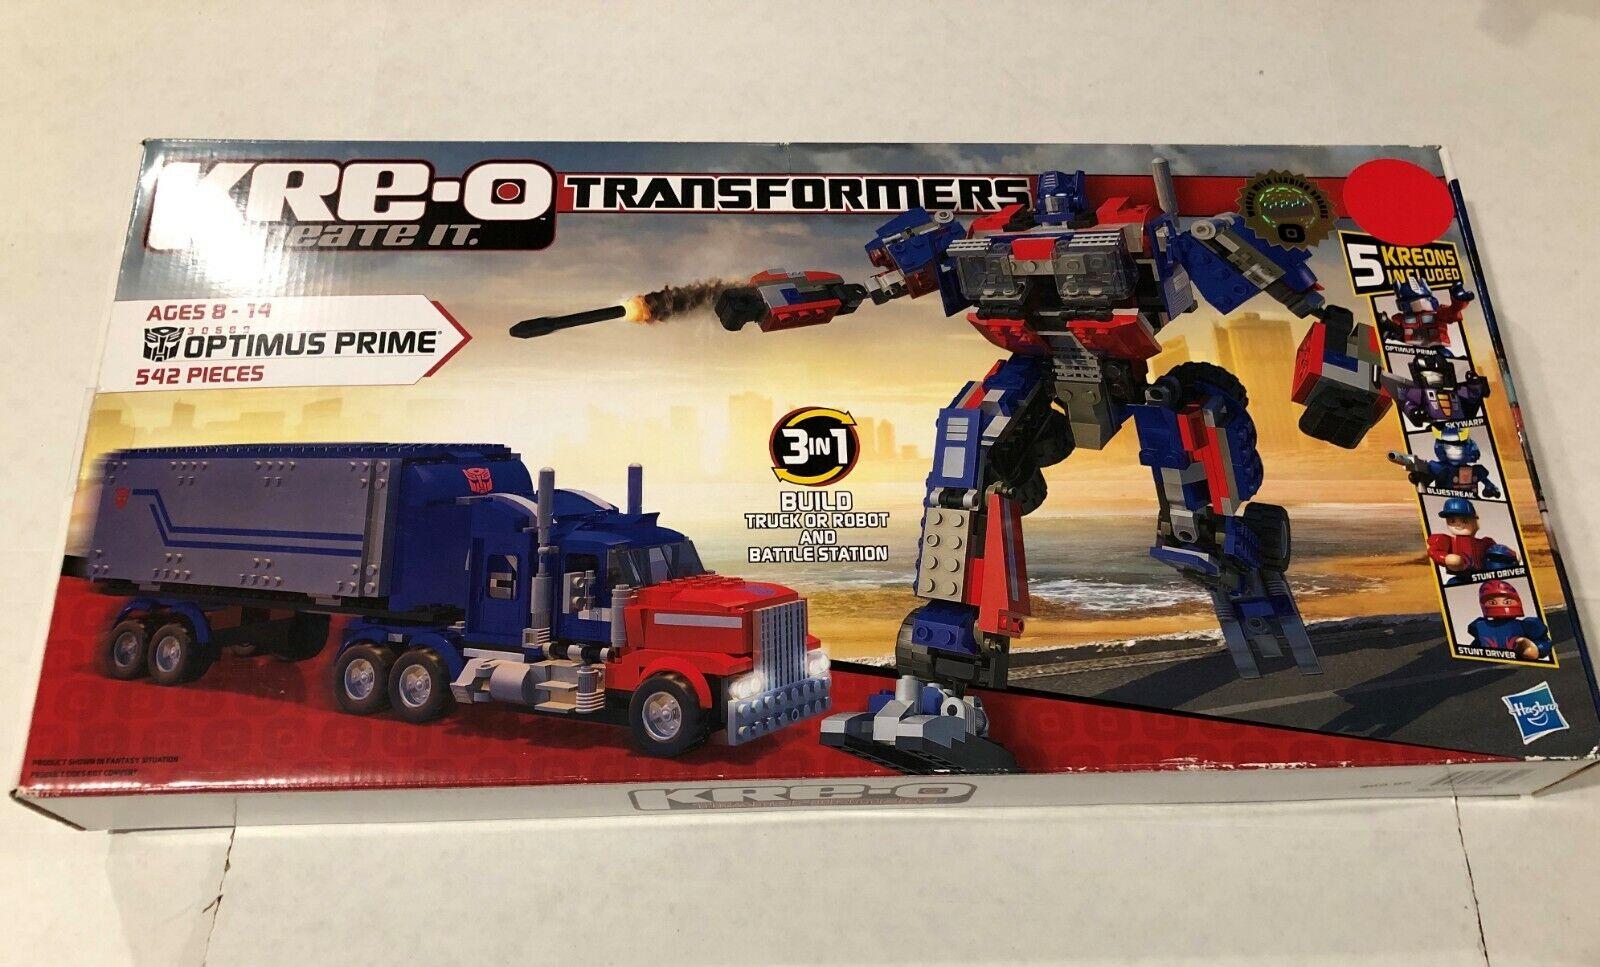 Hasbro Kre-o Transformers Optimus Prime Figura De Acción